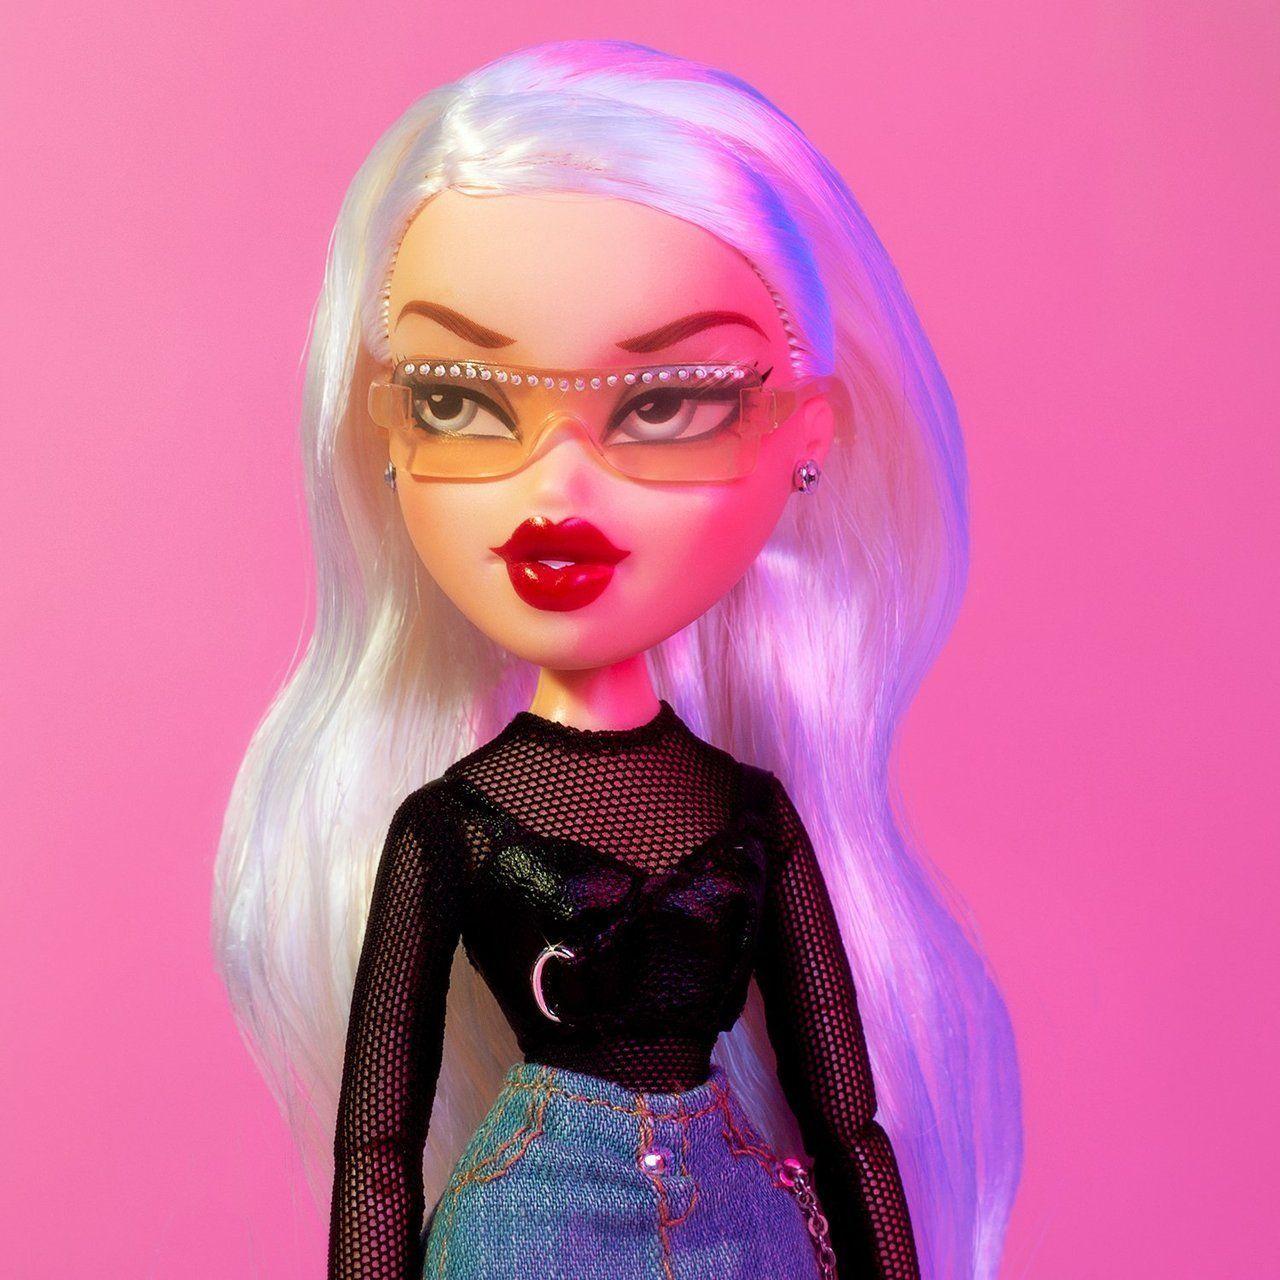 Bratz Cloe Red Lips Google Search Brat Doll Bratz Doll Bratz Girls